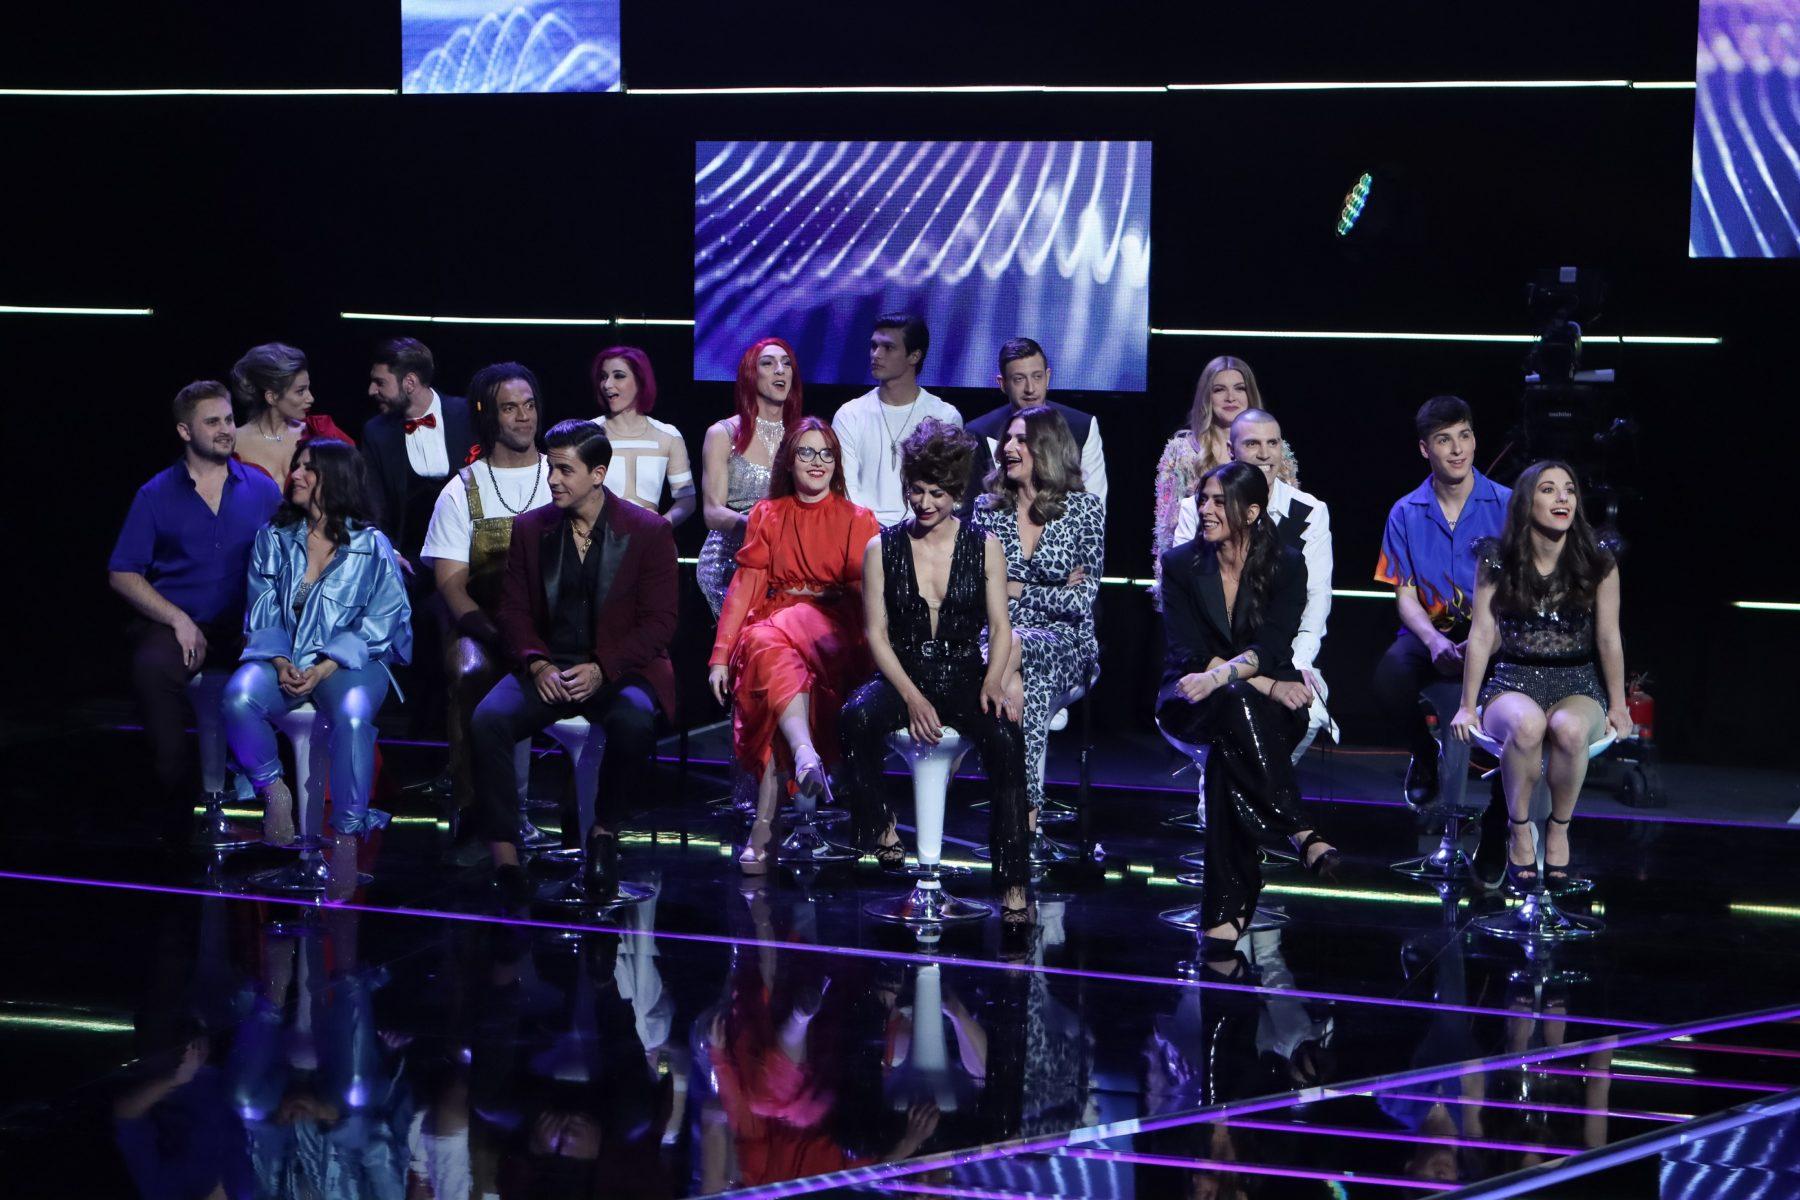 House of fame : Ένταση μεταξύ Πηνελόπης και Πέννυς Μπαλτατζή